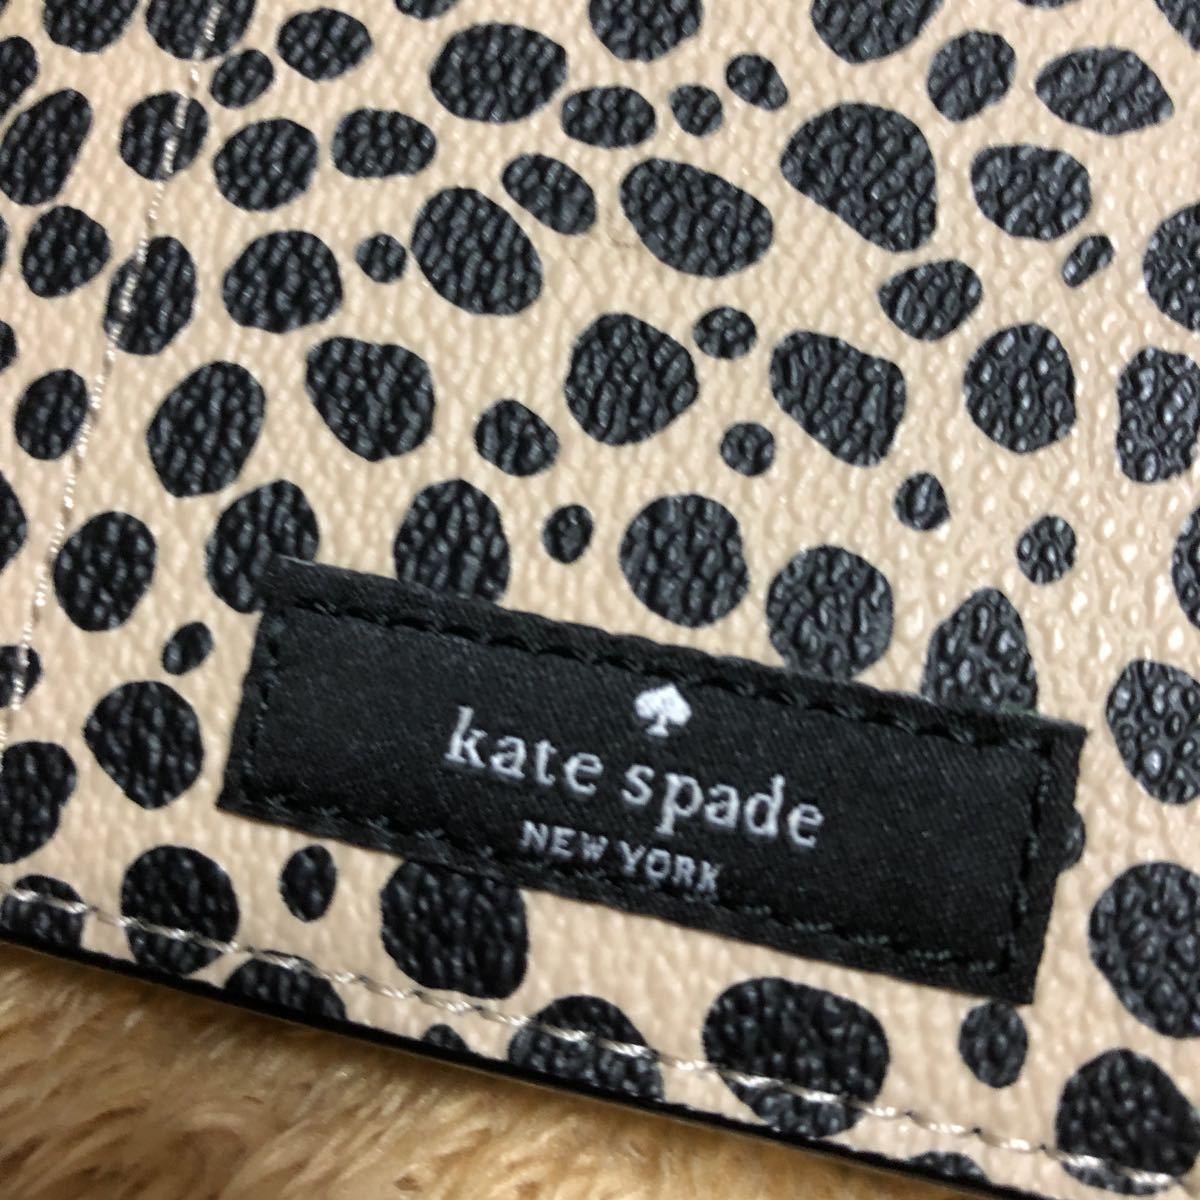 kate spade ケイトスペード☆非売品☆レア☆仕分けポーチ☆小物入れ☆バッグインポーチ☆ヒョウ柄☆M702